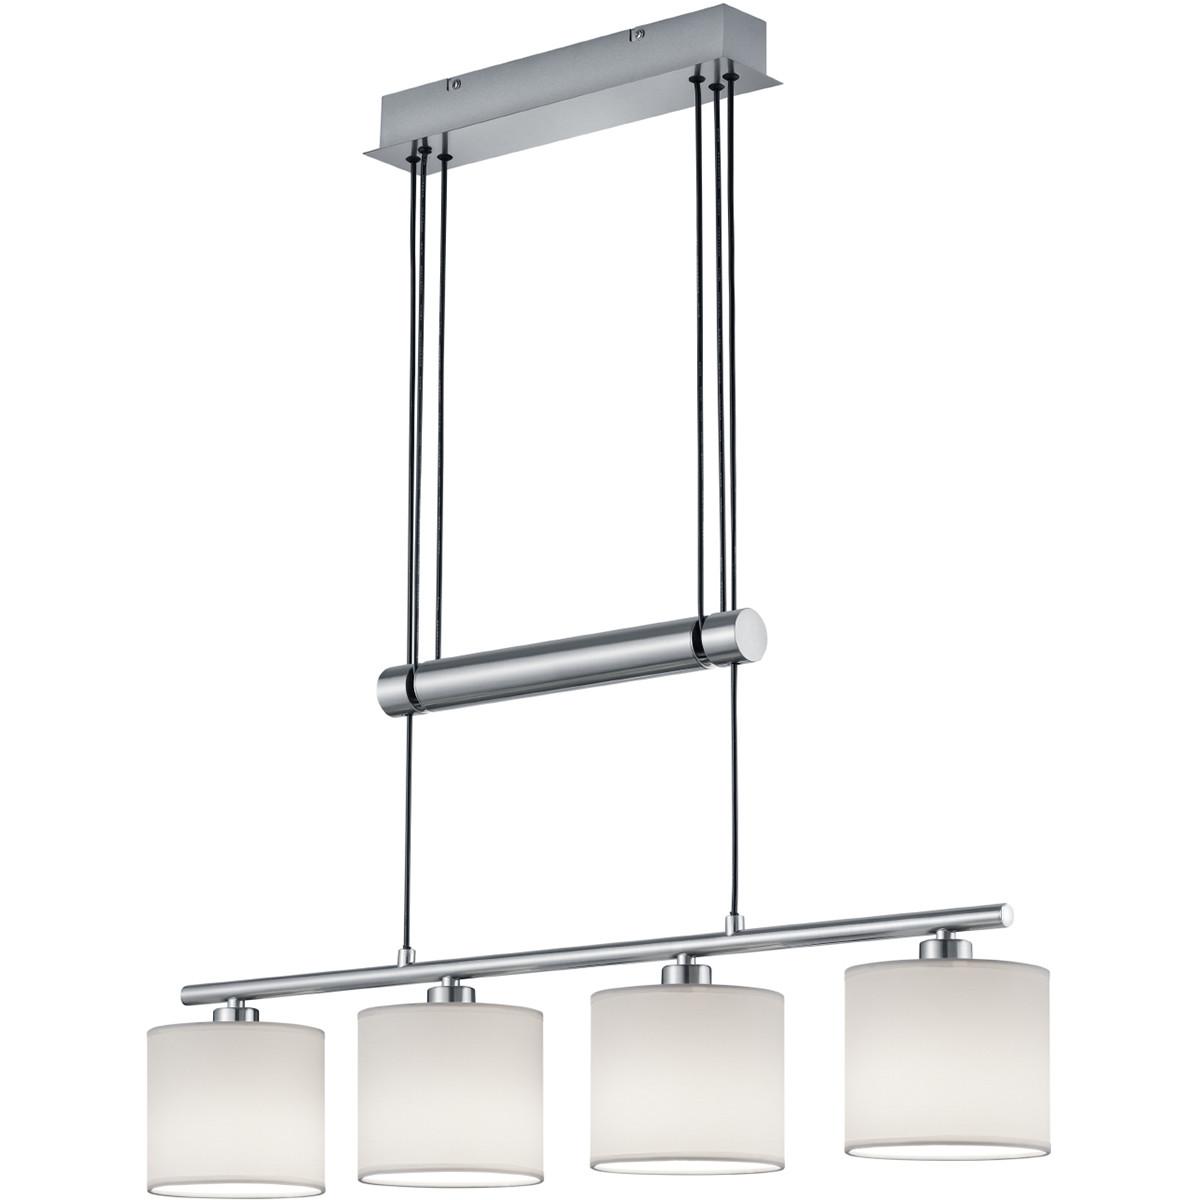 LED Hanglamp - Trion Gorino - E14 Fitting - 4-lichts - Rechthoek - Mat Wit - Aluminium